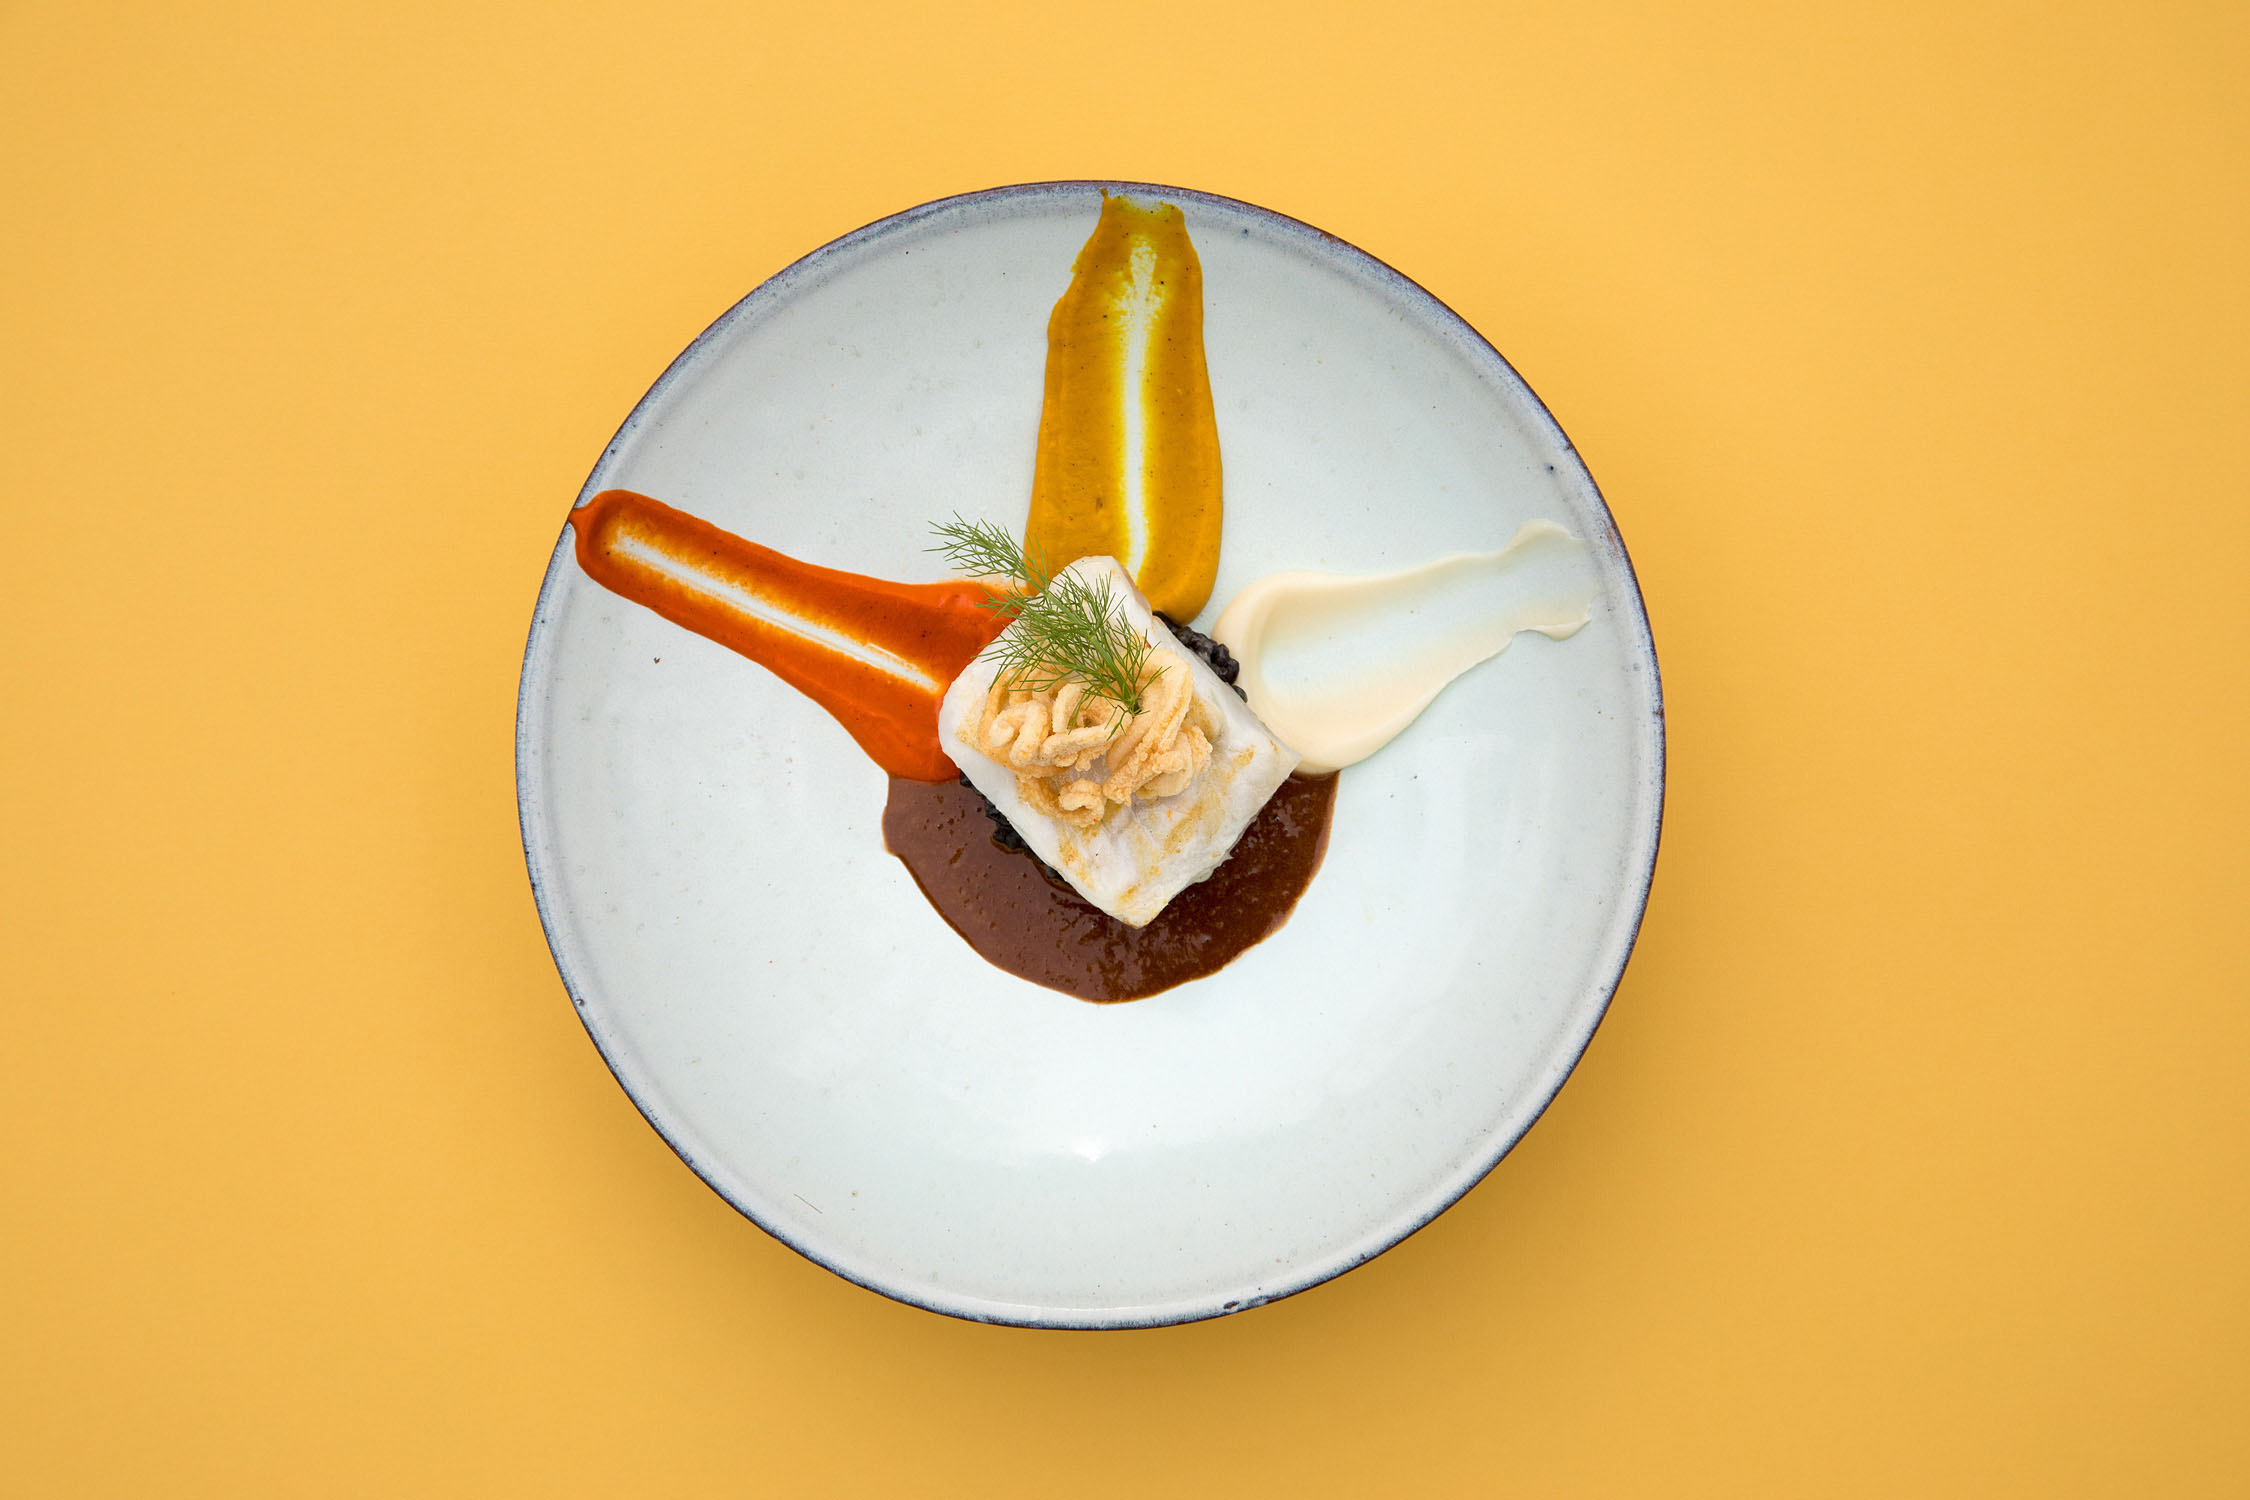 Restaurant De Moerbei-9459.jpg